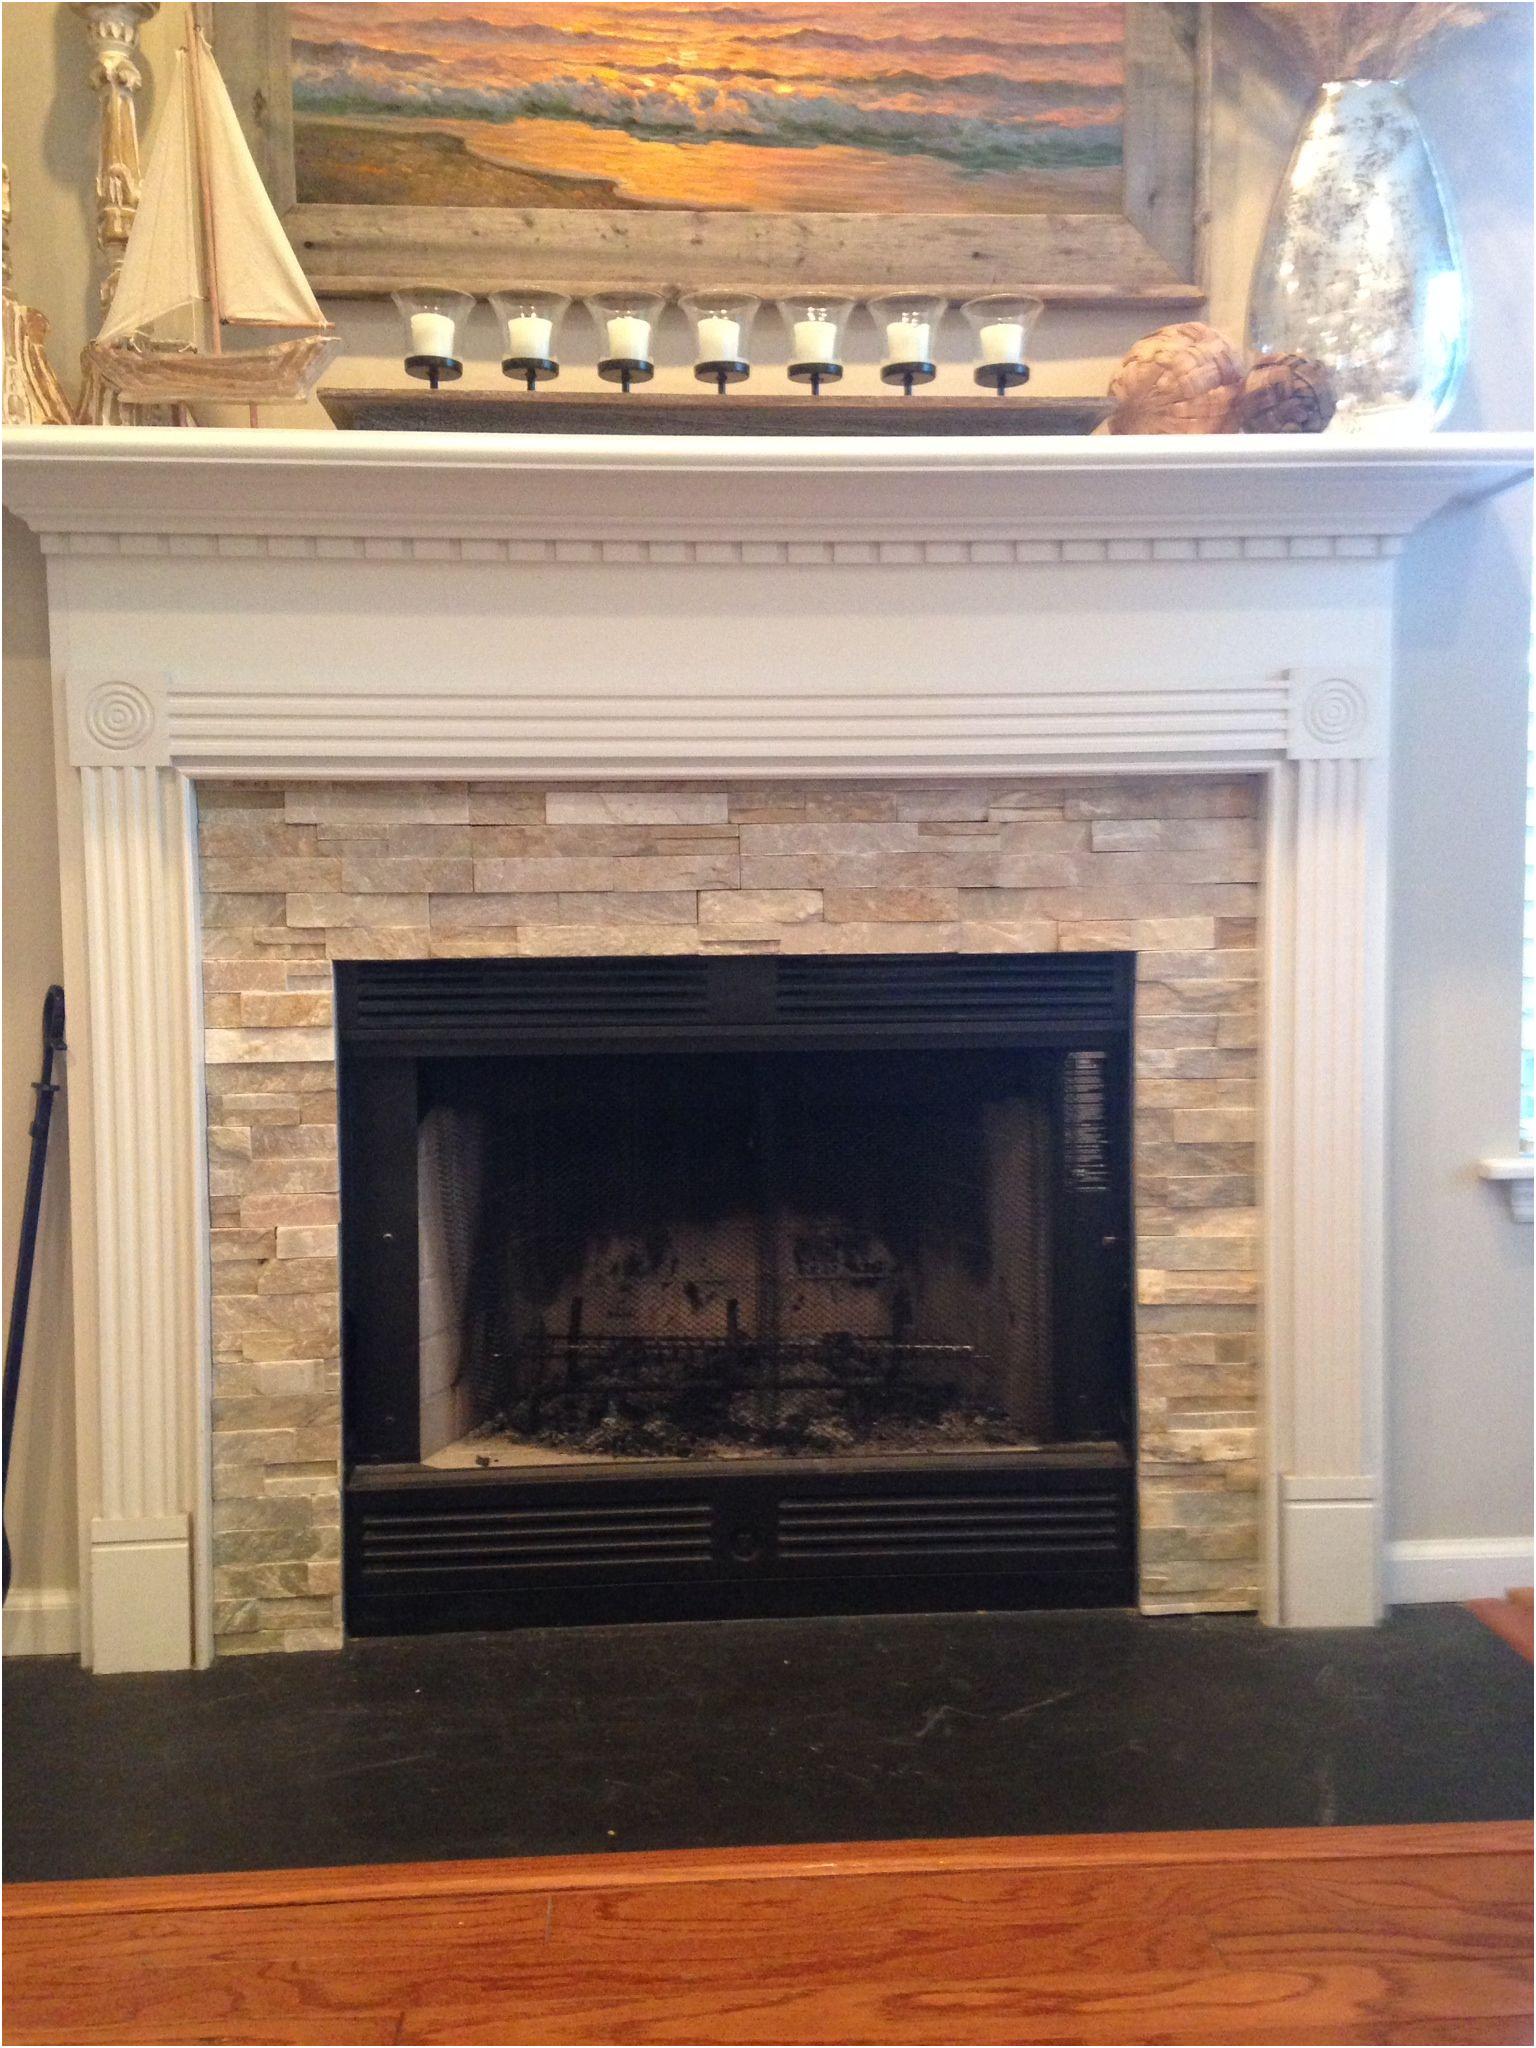 Fireplace Remodel Ideas Best Of Fireplace Idea Mantel Wainscoting Design Craftsman